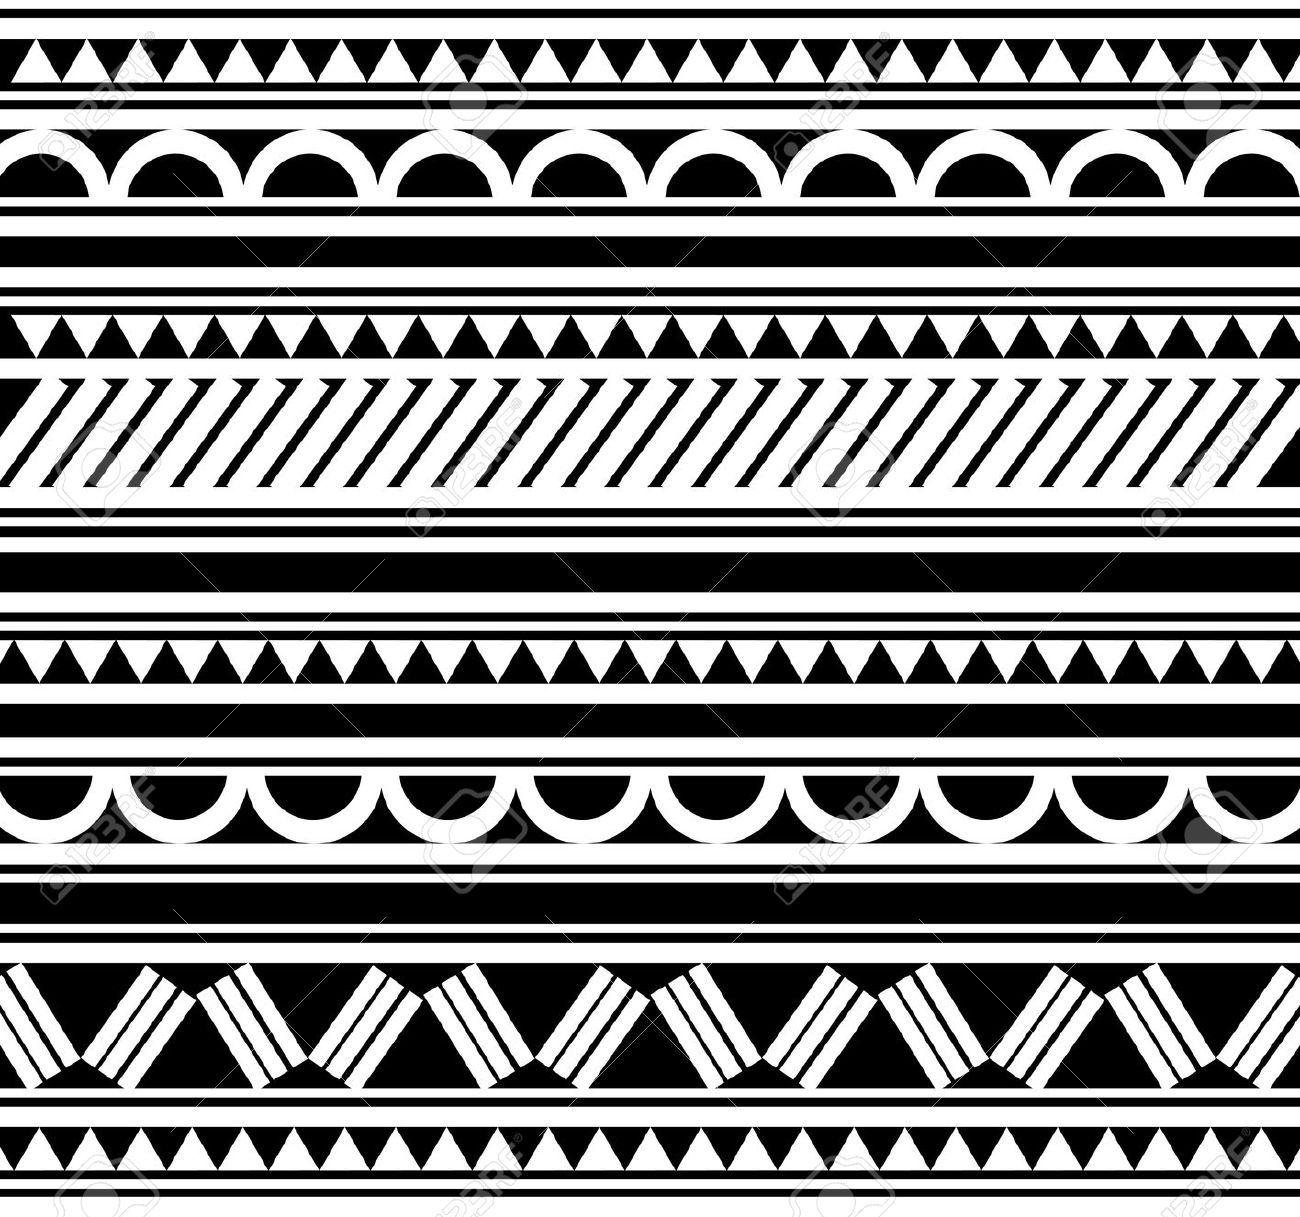 Bracelet Polynésien Tatouage pour indigenous patterns - google search | tatoo designs | pinterest